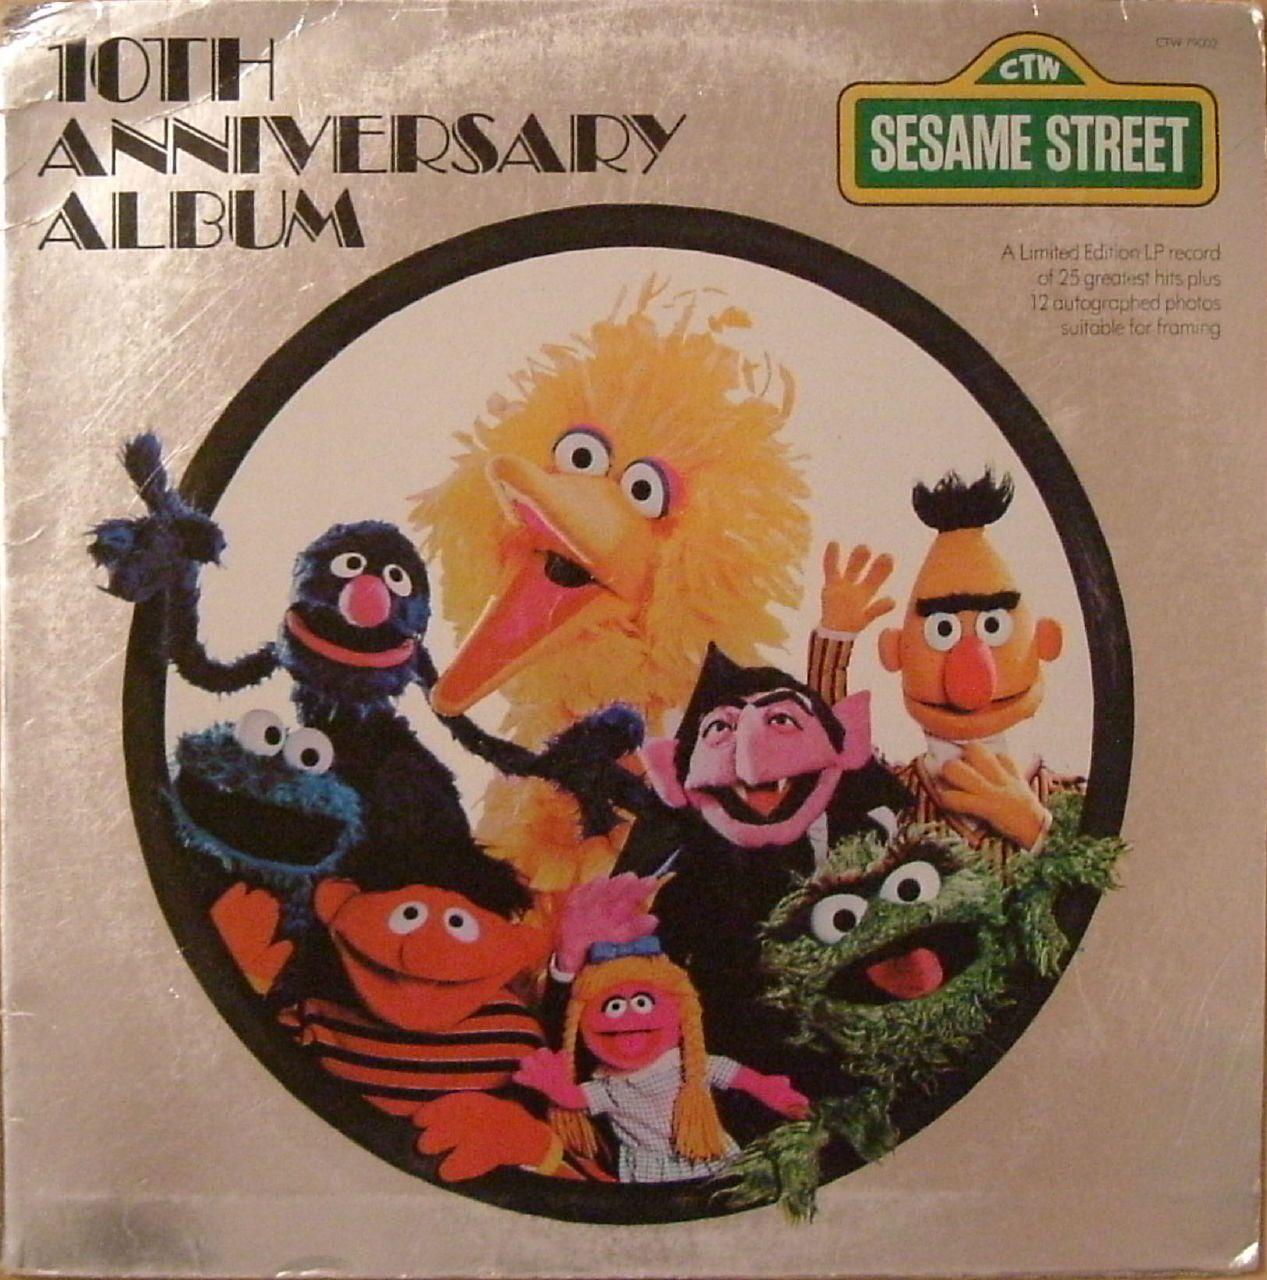 Sesame Street Music Archive: 10th Anniversary Album